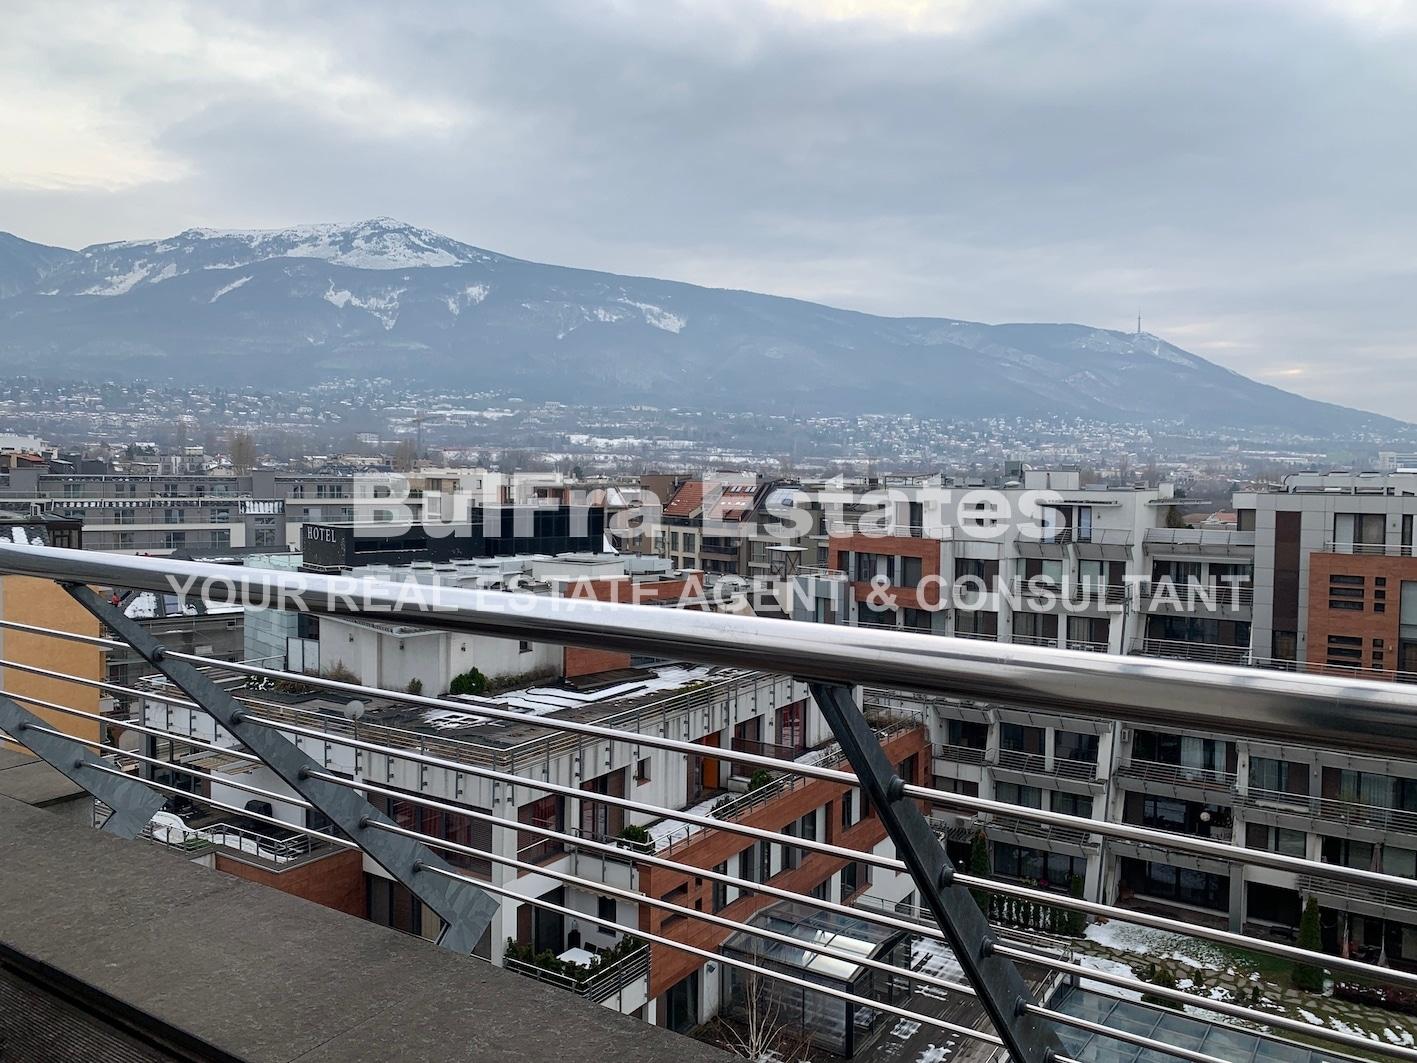 Silver city - Sofia